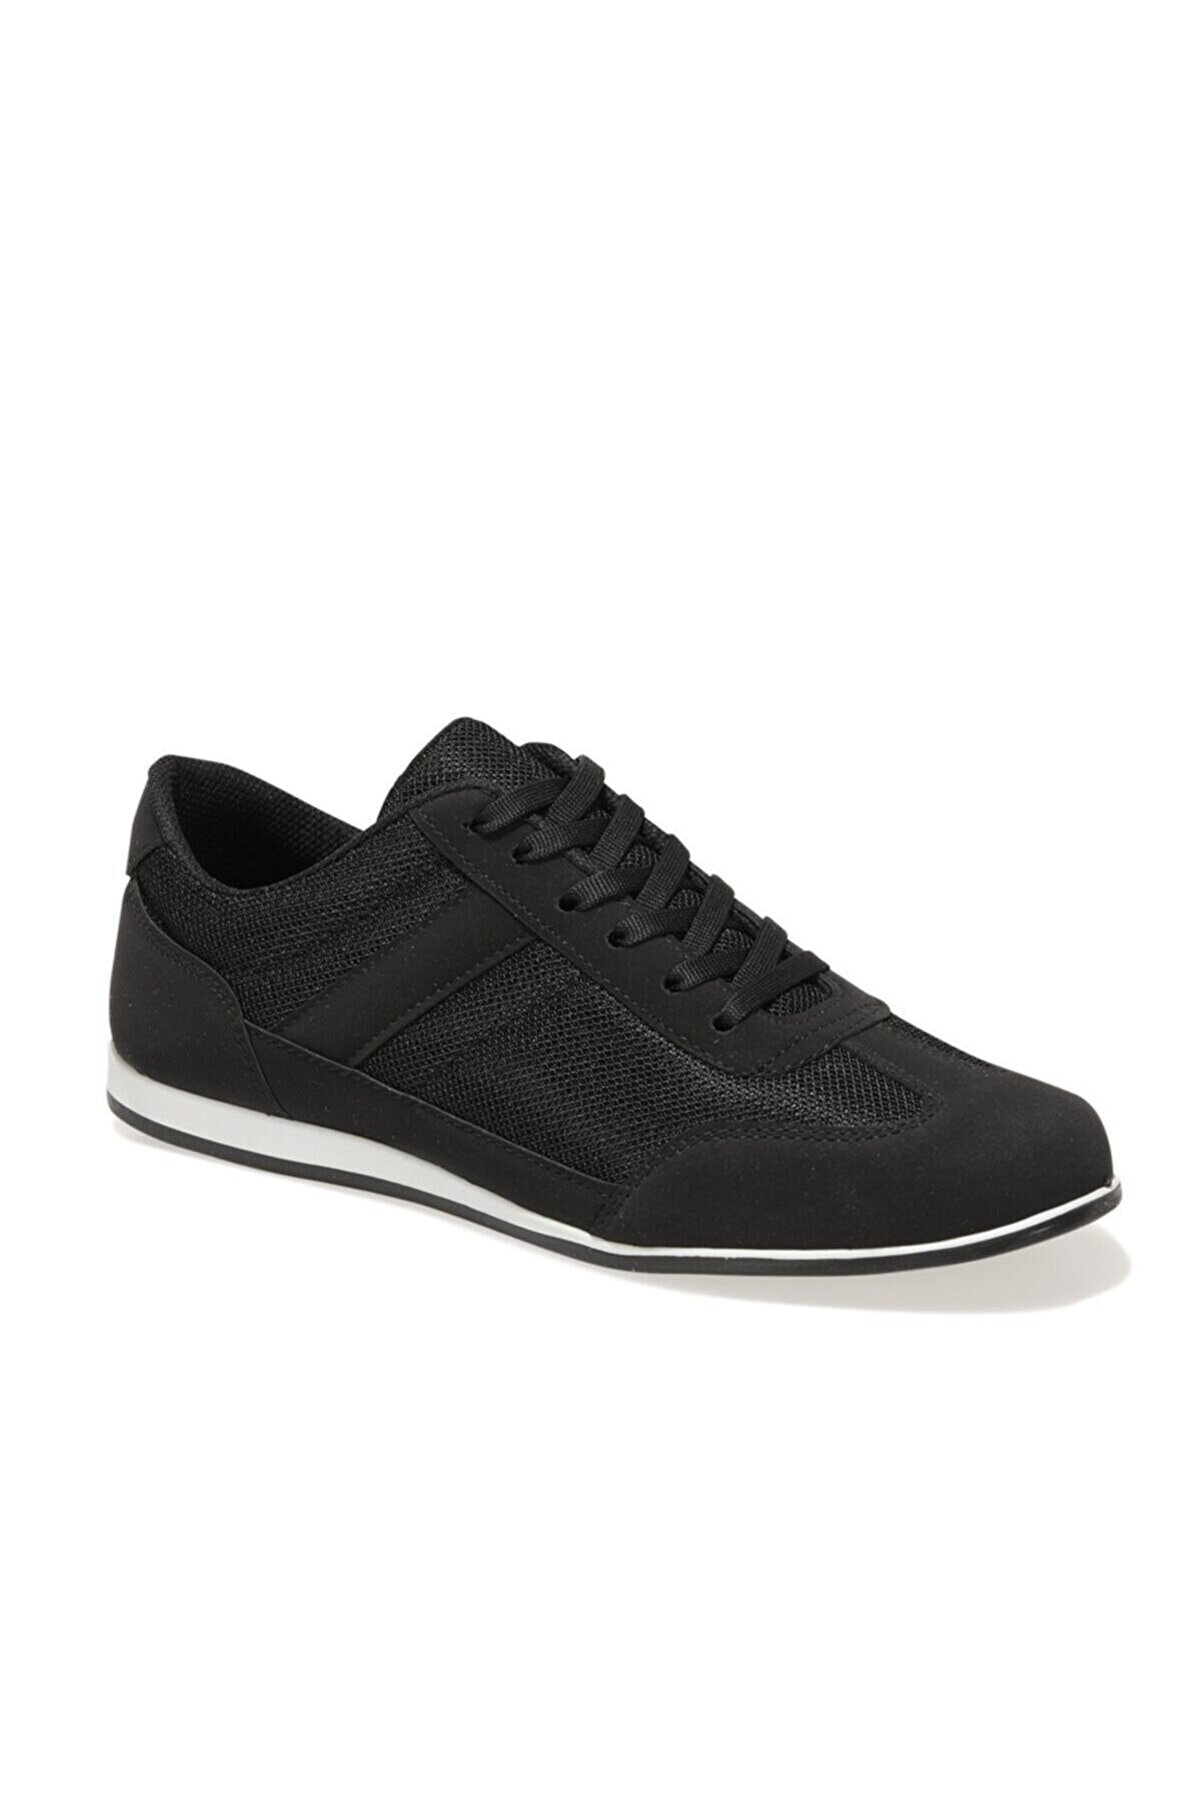 Polaris 356742.M1FX Siyah Erkek Sneaker Ayakkabı 100936368